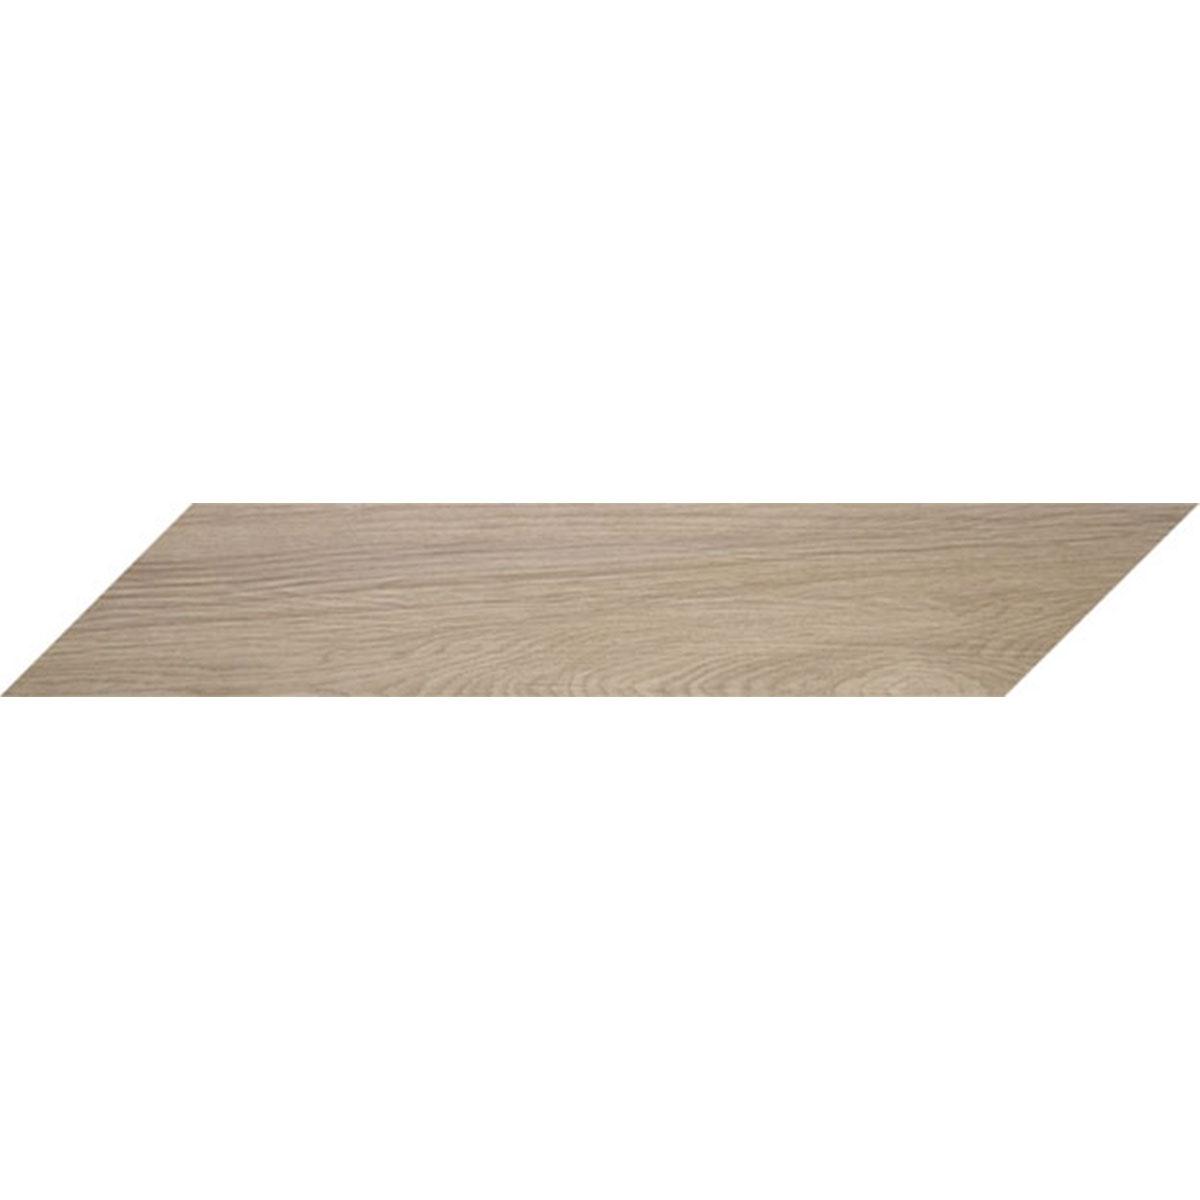 Timberland - Oak Chevron - Timber Look Tiles - Stone3 Brisbane